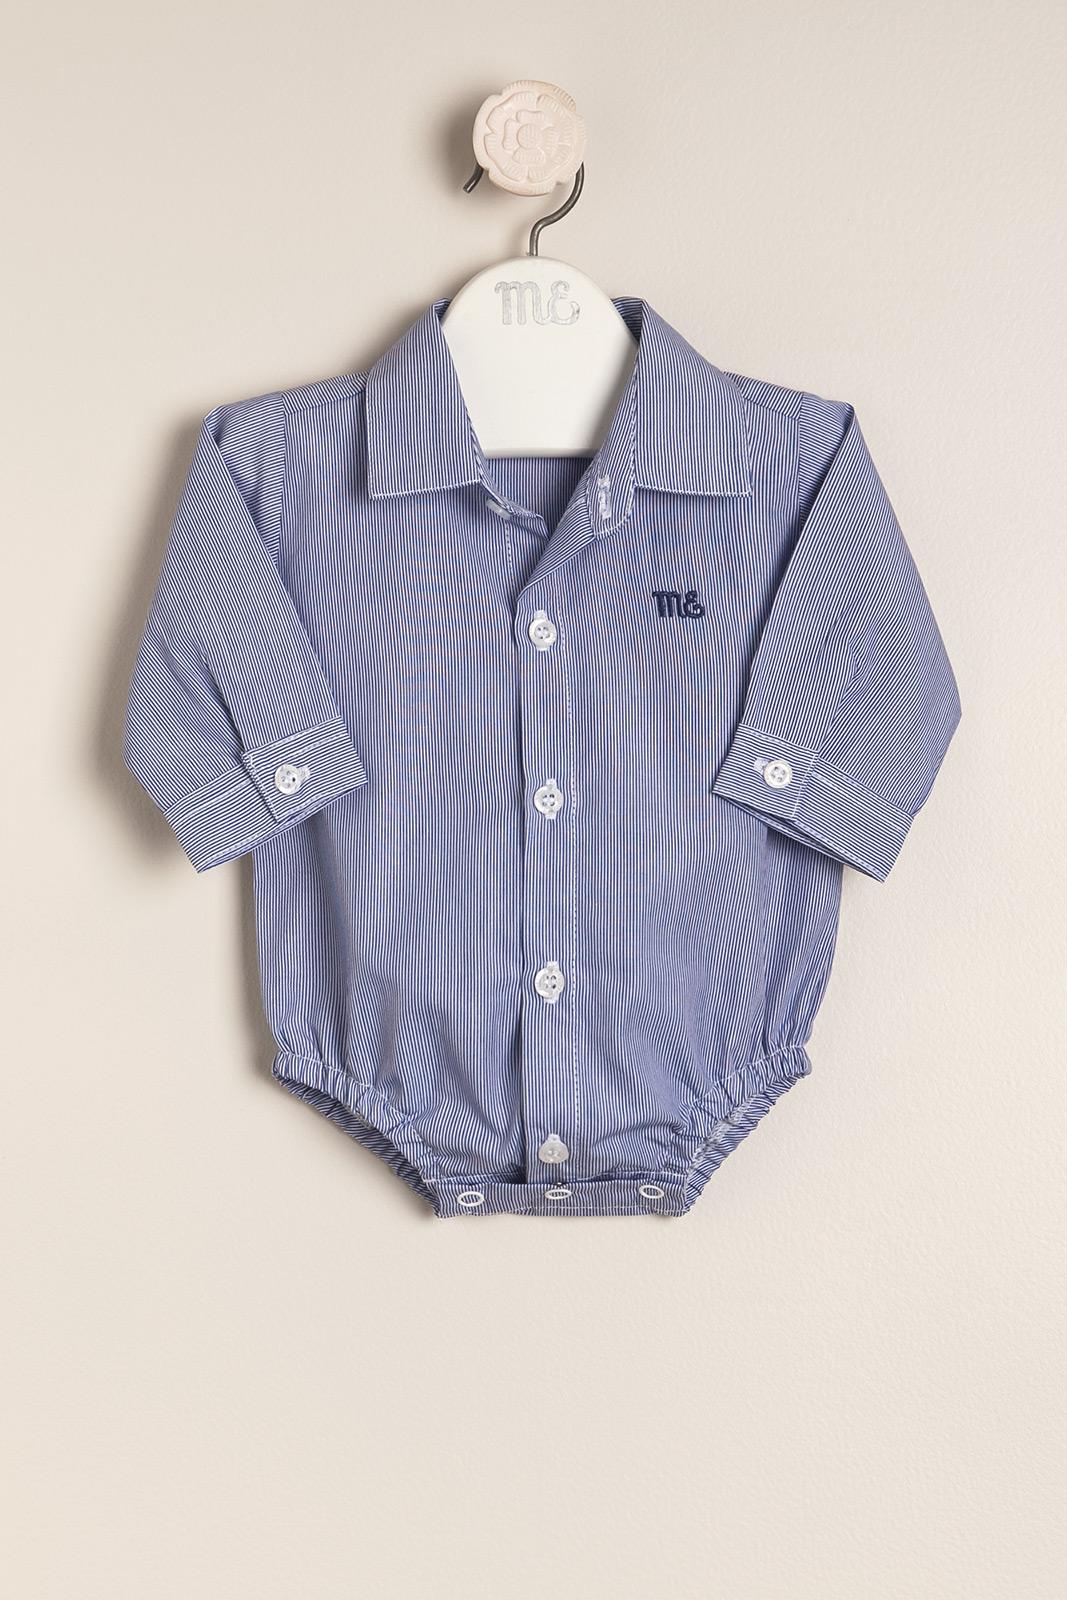 Body camisa Andre bco/azul